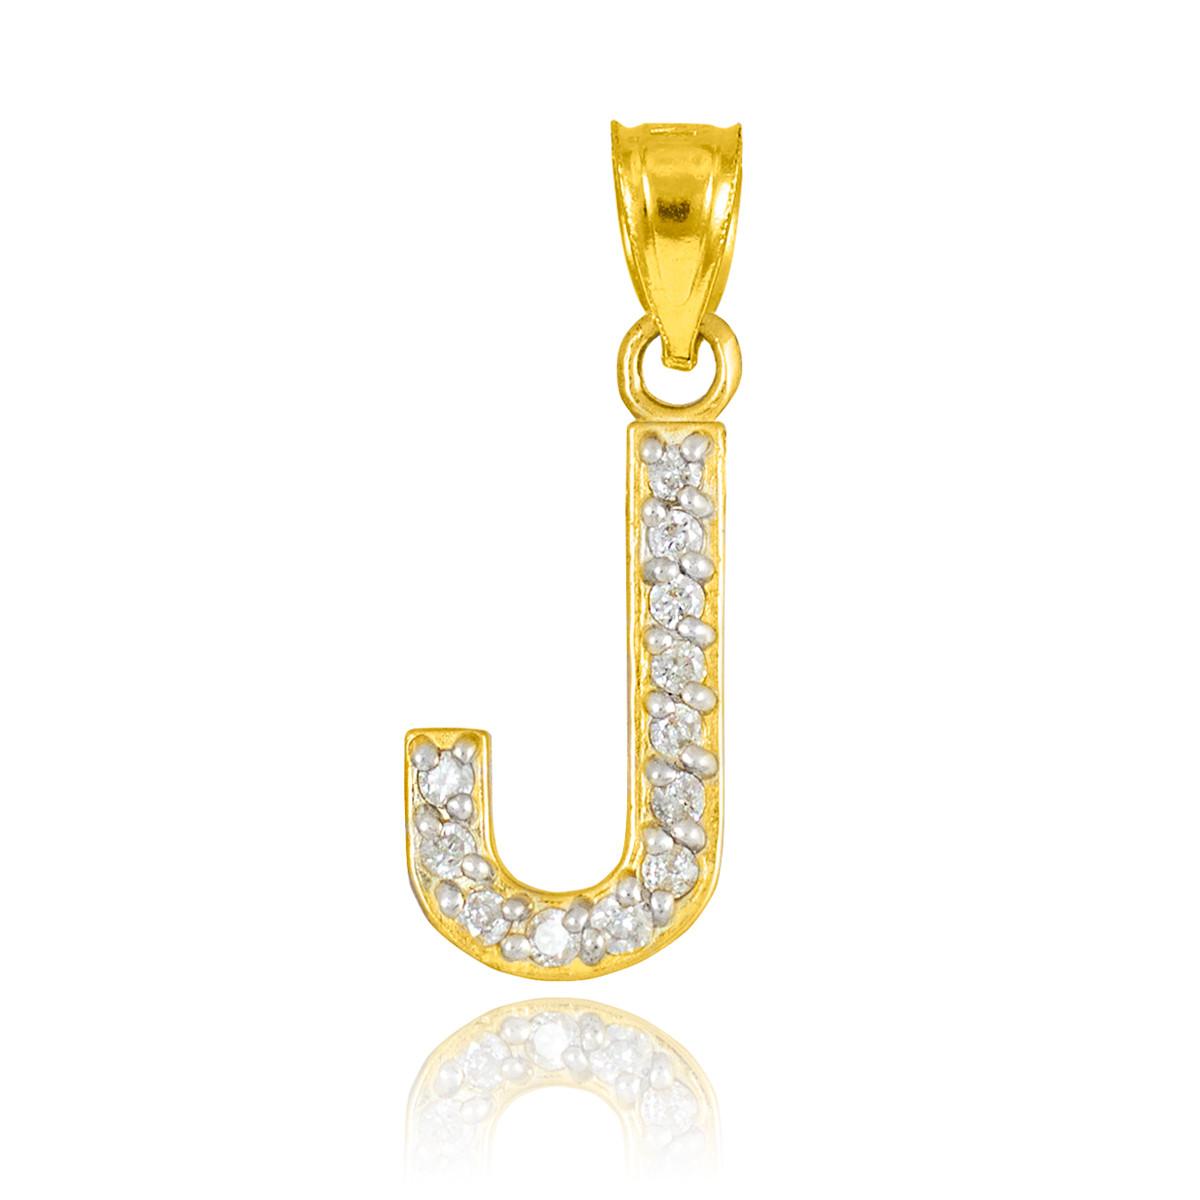 10k letter quotjquot initial gold pendant necklace with diamonds With gold letter j pendant